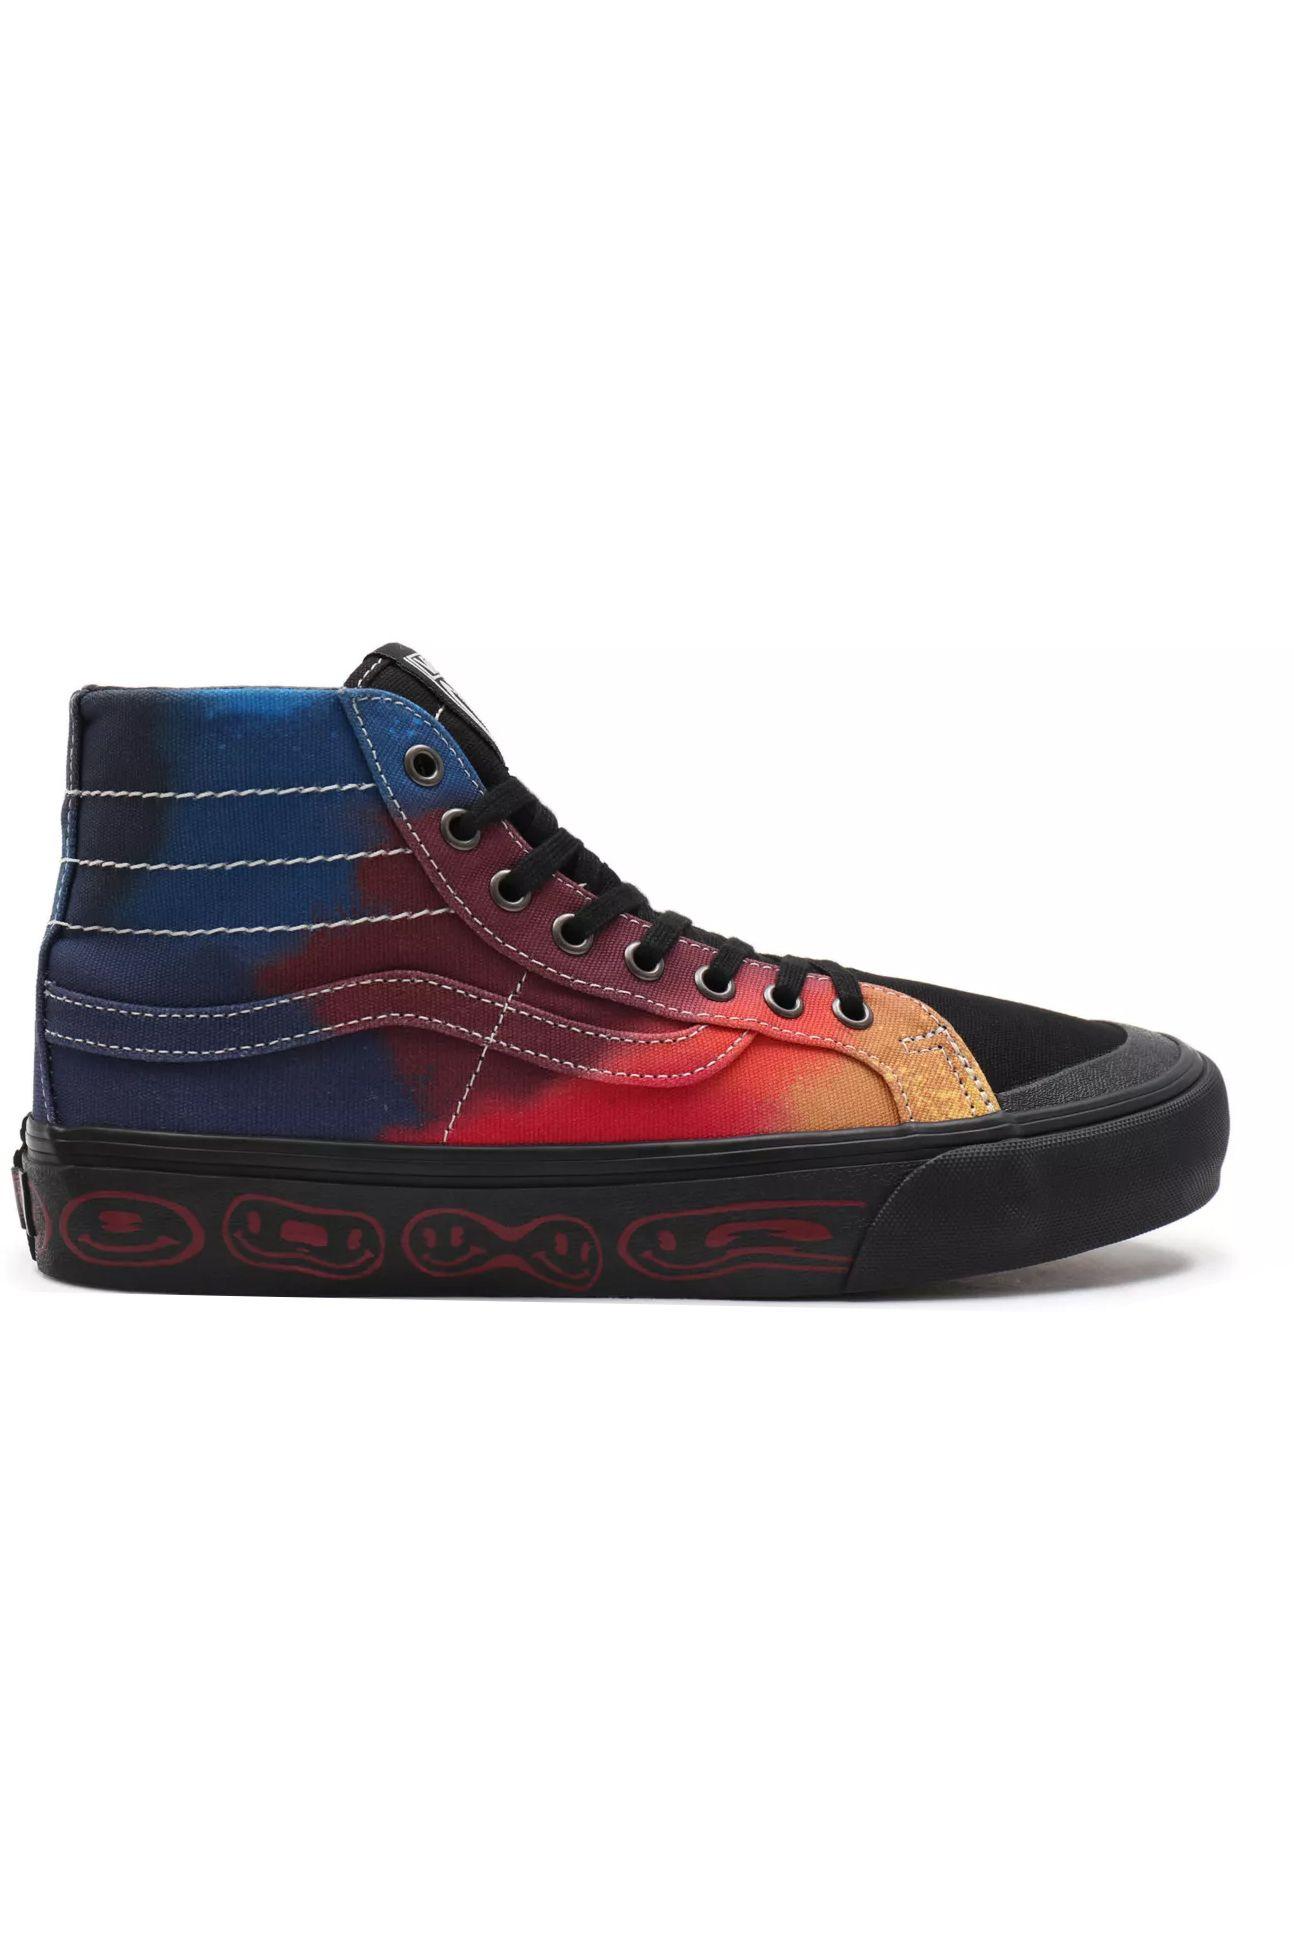 Vans Shoes UA SK8-HI 138 DECON SF (Have A Trip) Multi/Black